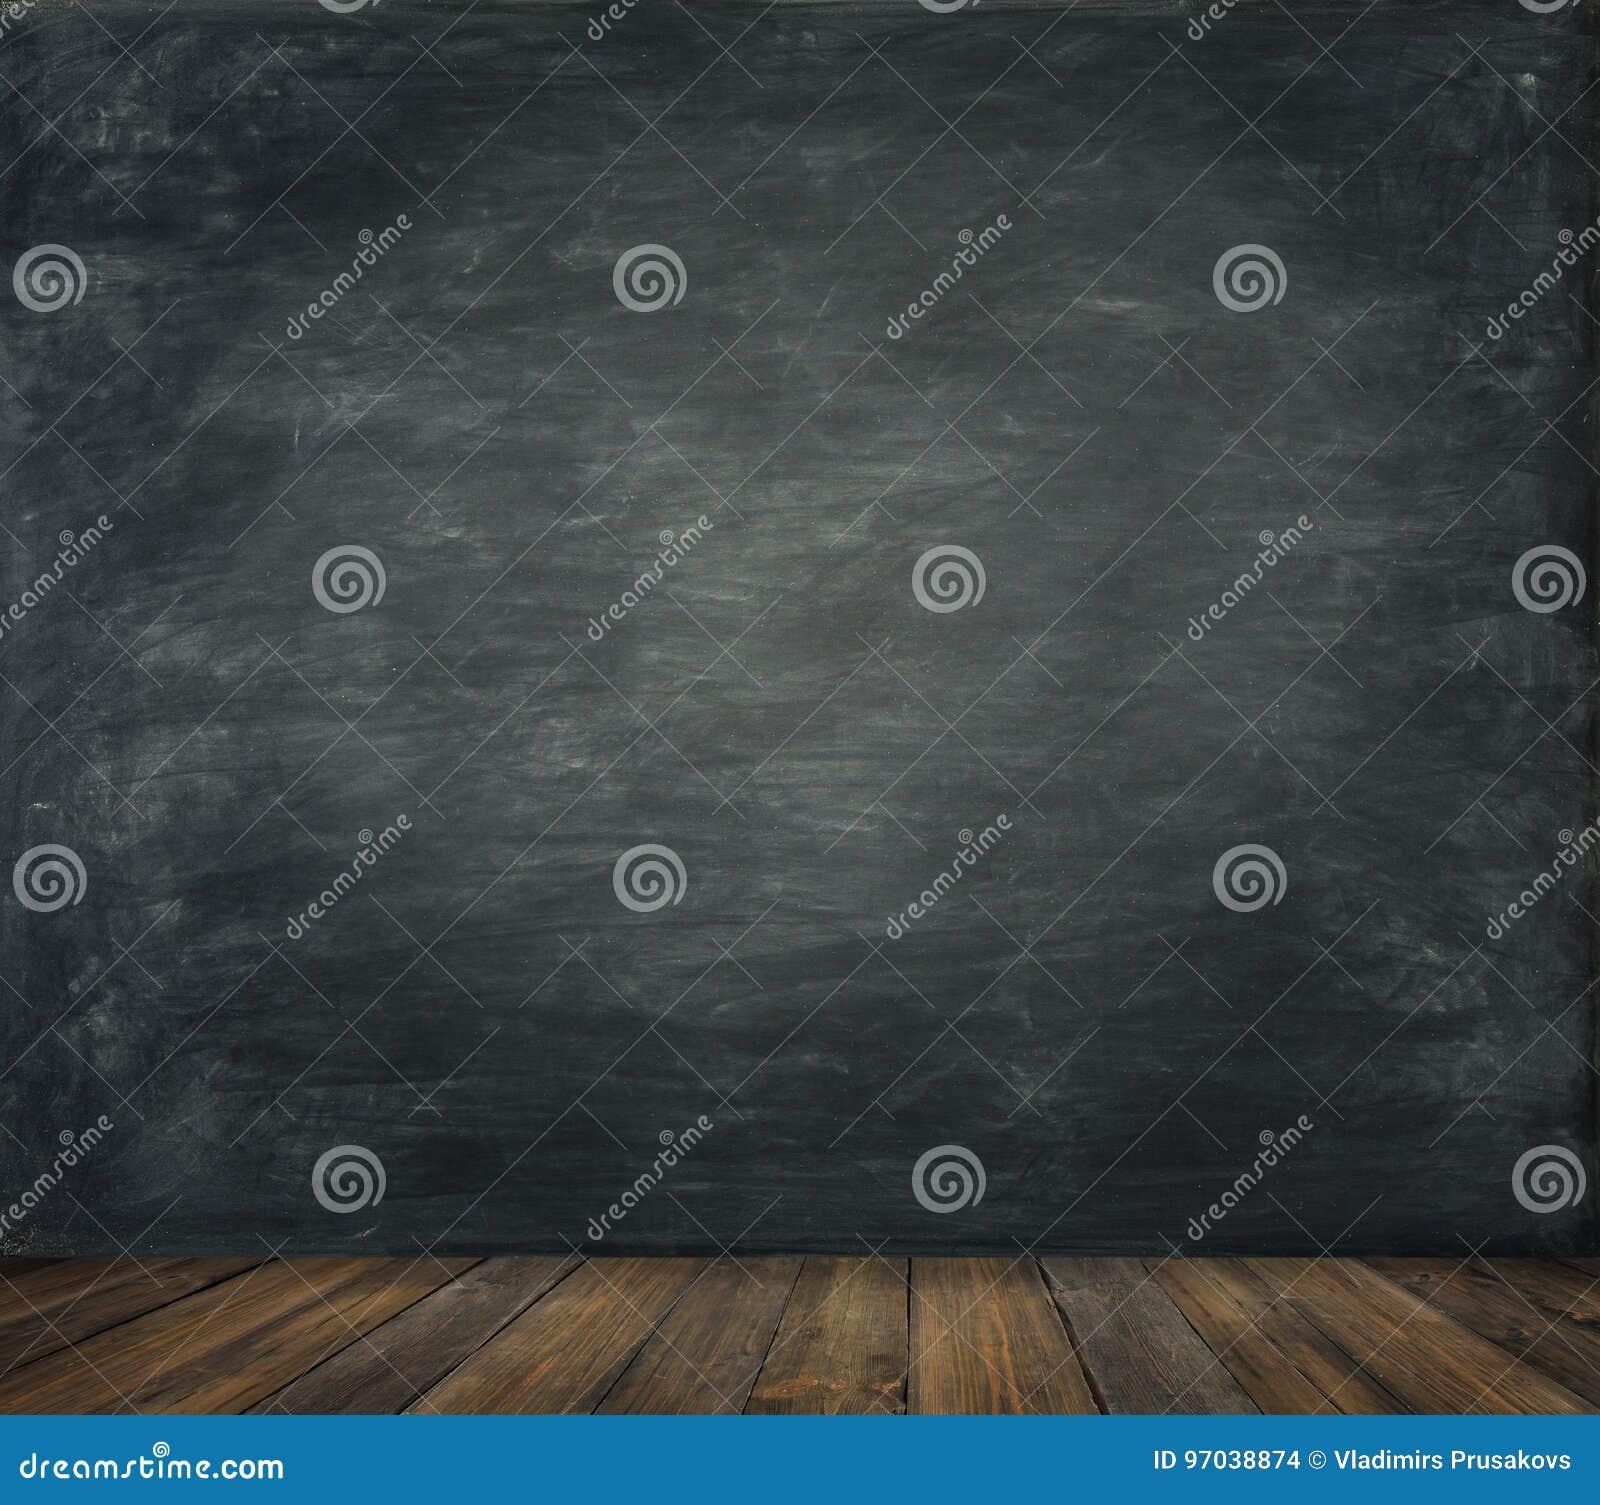 creative wooden floor with a blackboard car